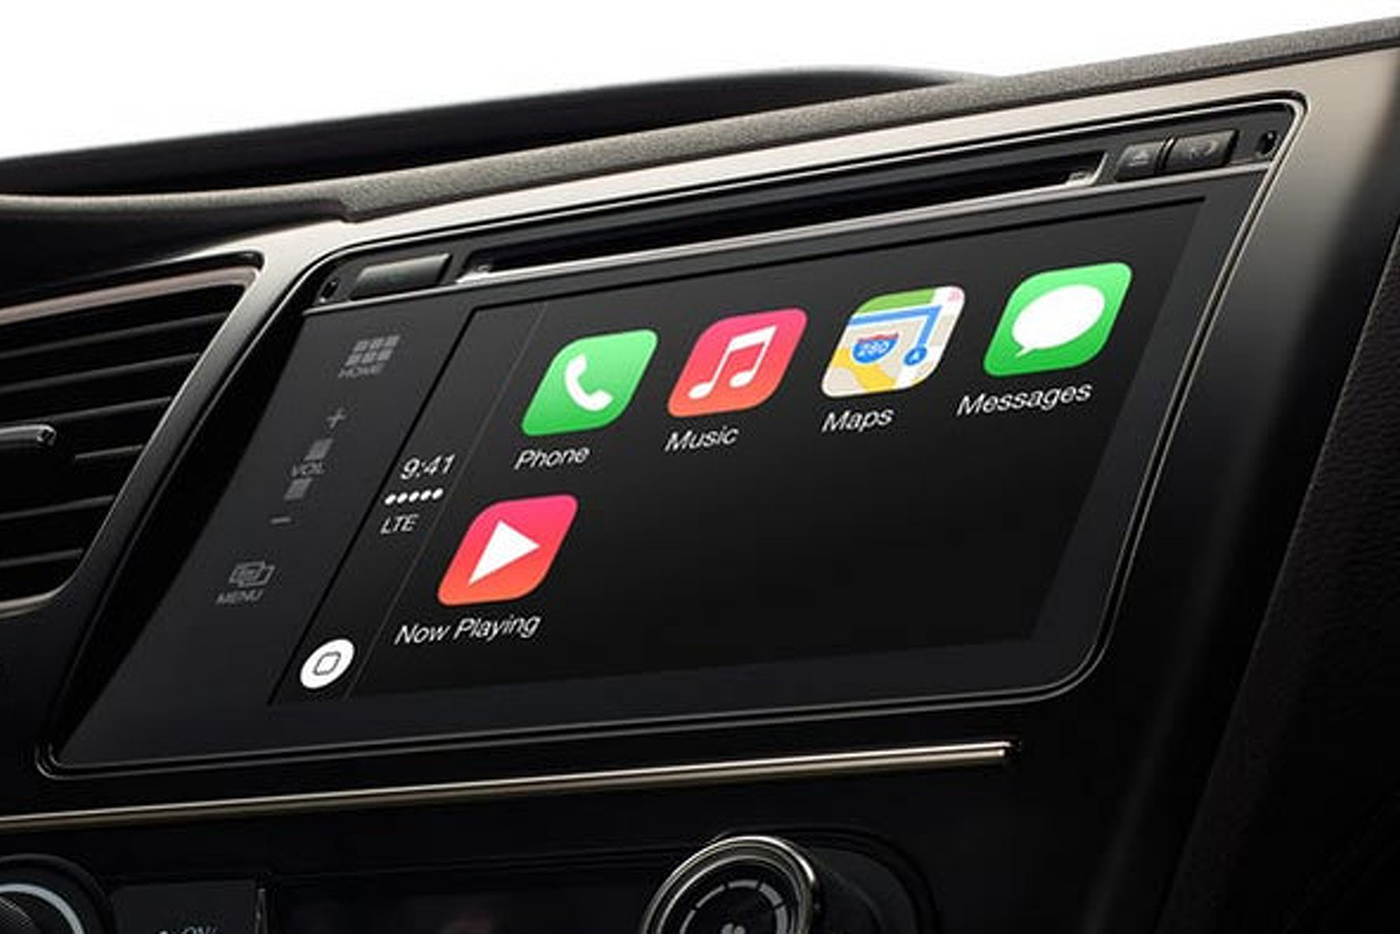 ford-toyota-android-auto-apple-carplay-1.jpg